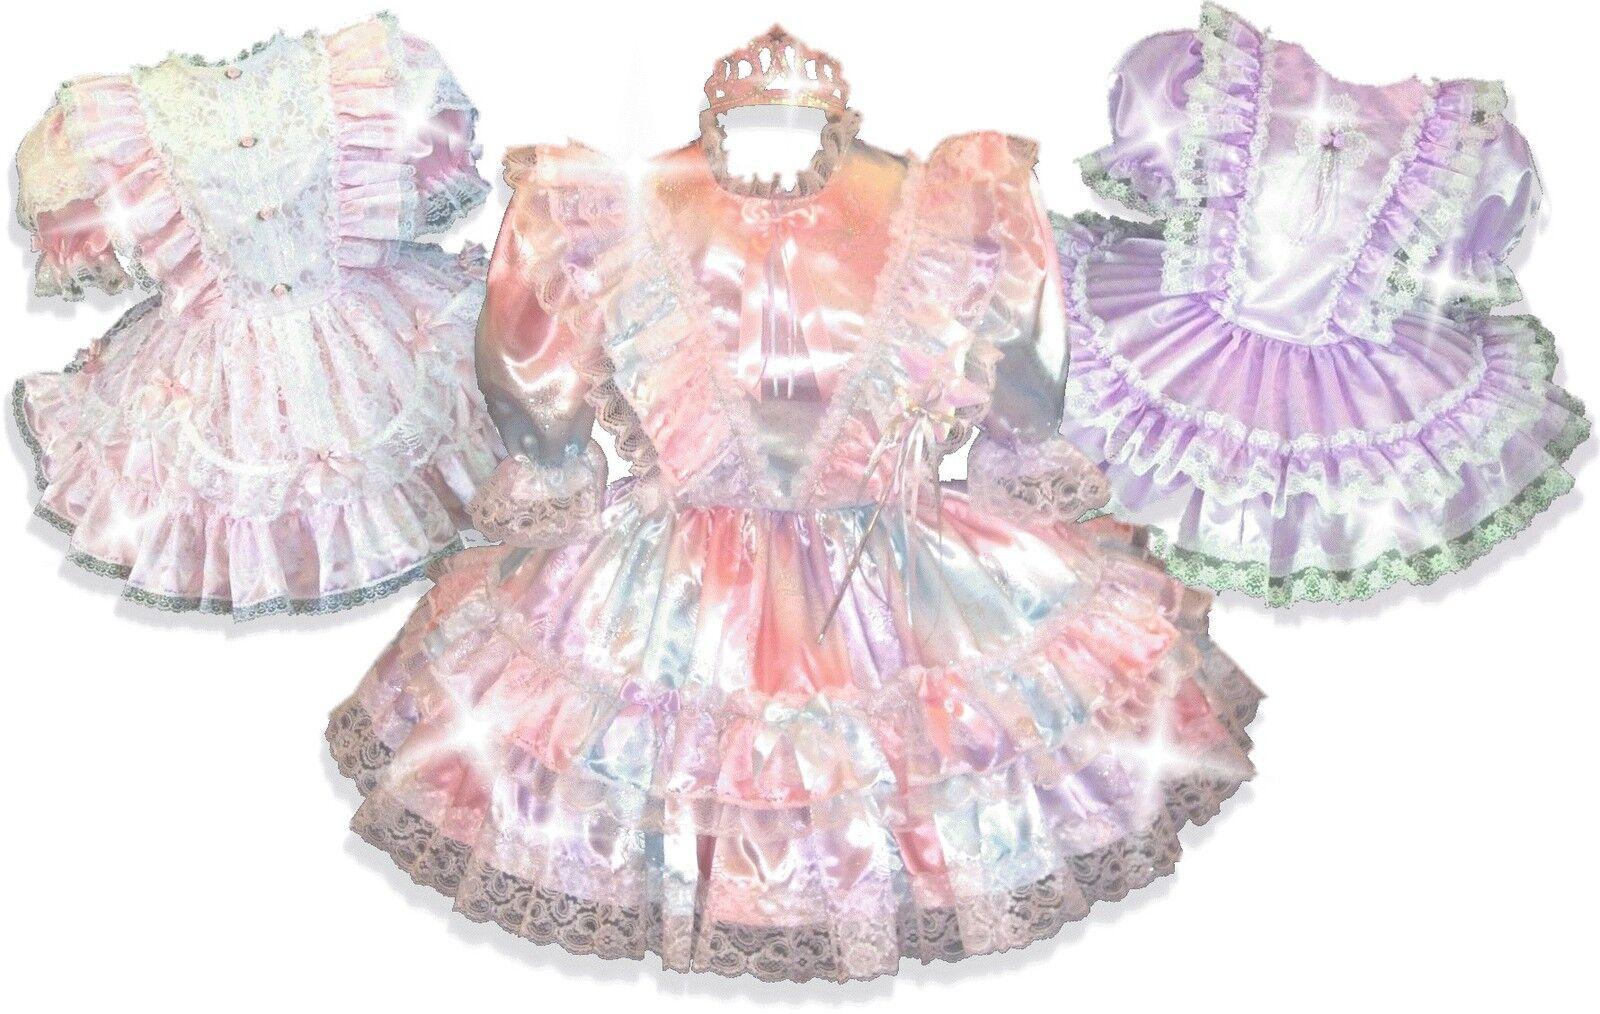 Leanne's Pretty Dresses